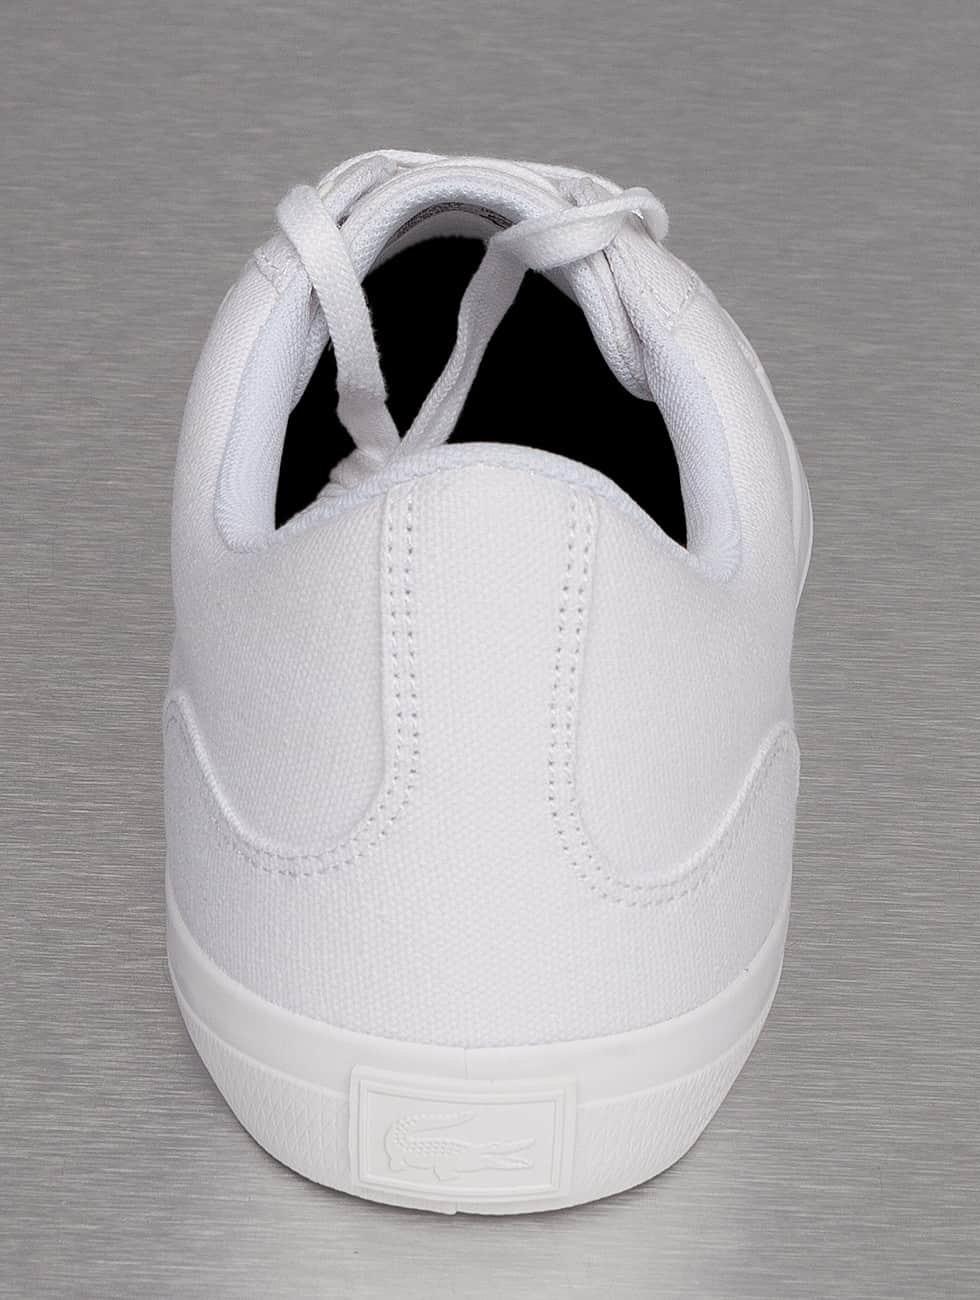 fde1526e8c Came Chaussure 303 Bl2 Lerond Blanc Lacoste Viurxwtiq 729 En 54xqOwd5A